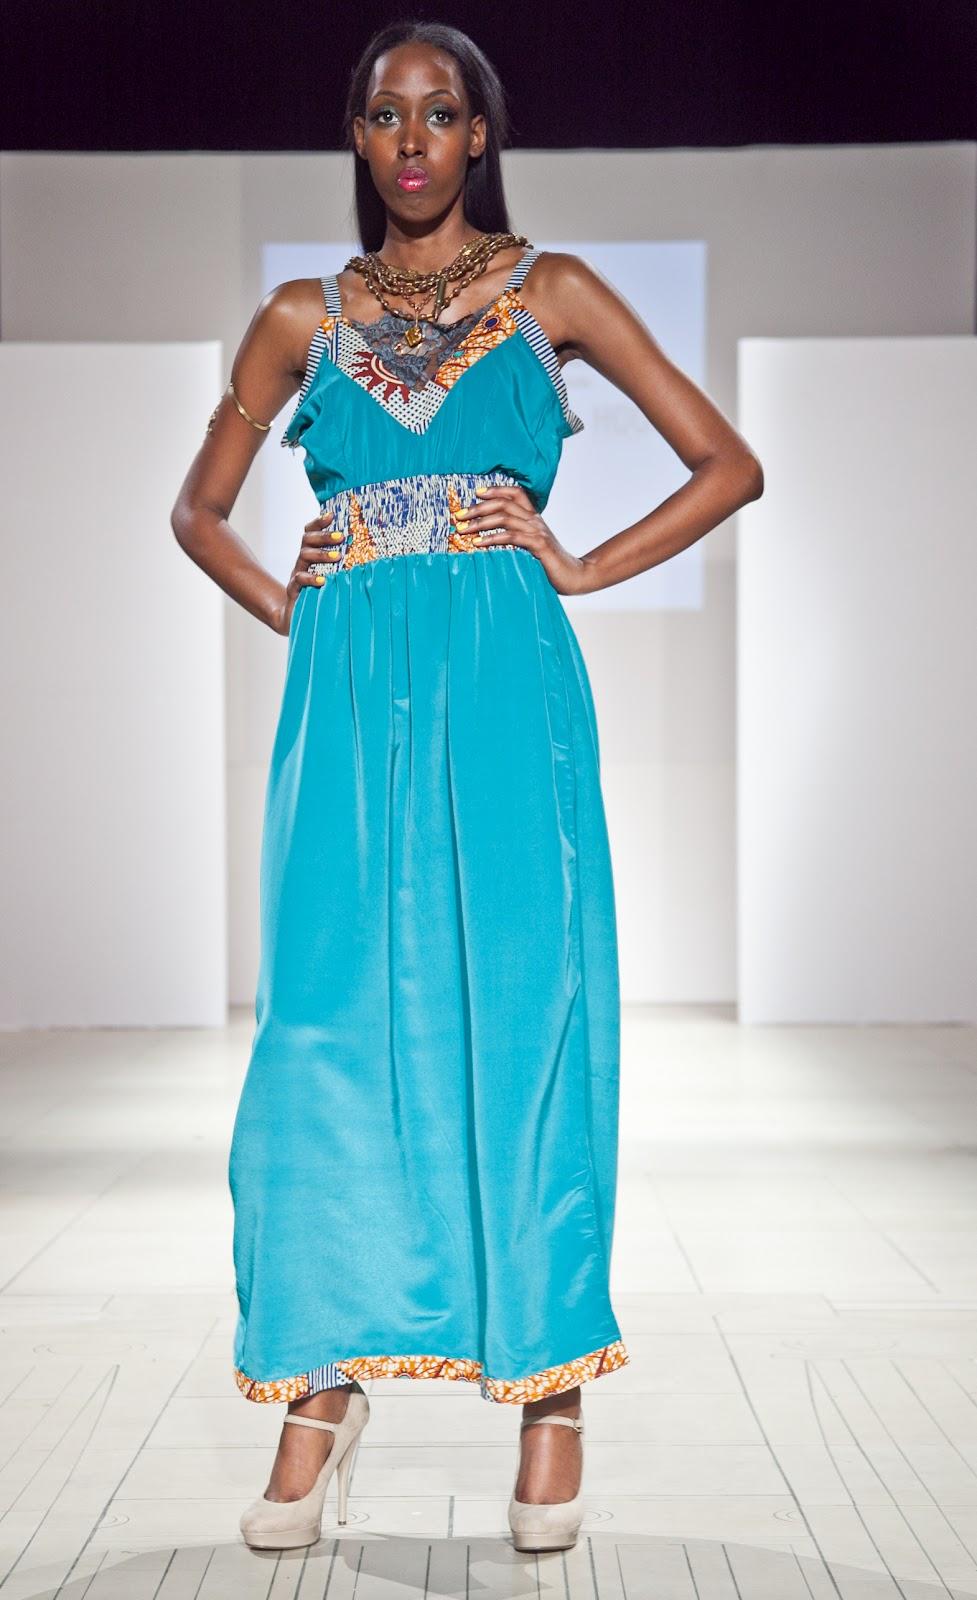 I Rep Camer Kibonen Ny Mesanga Fashion House At Afwny